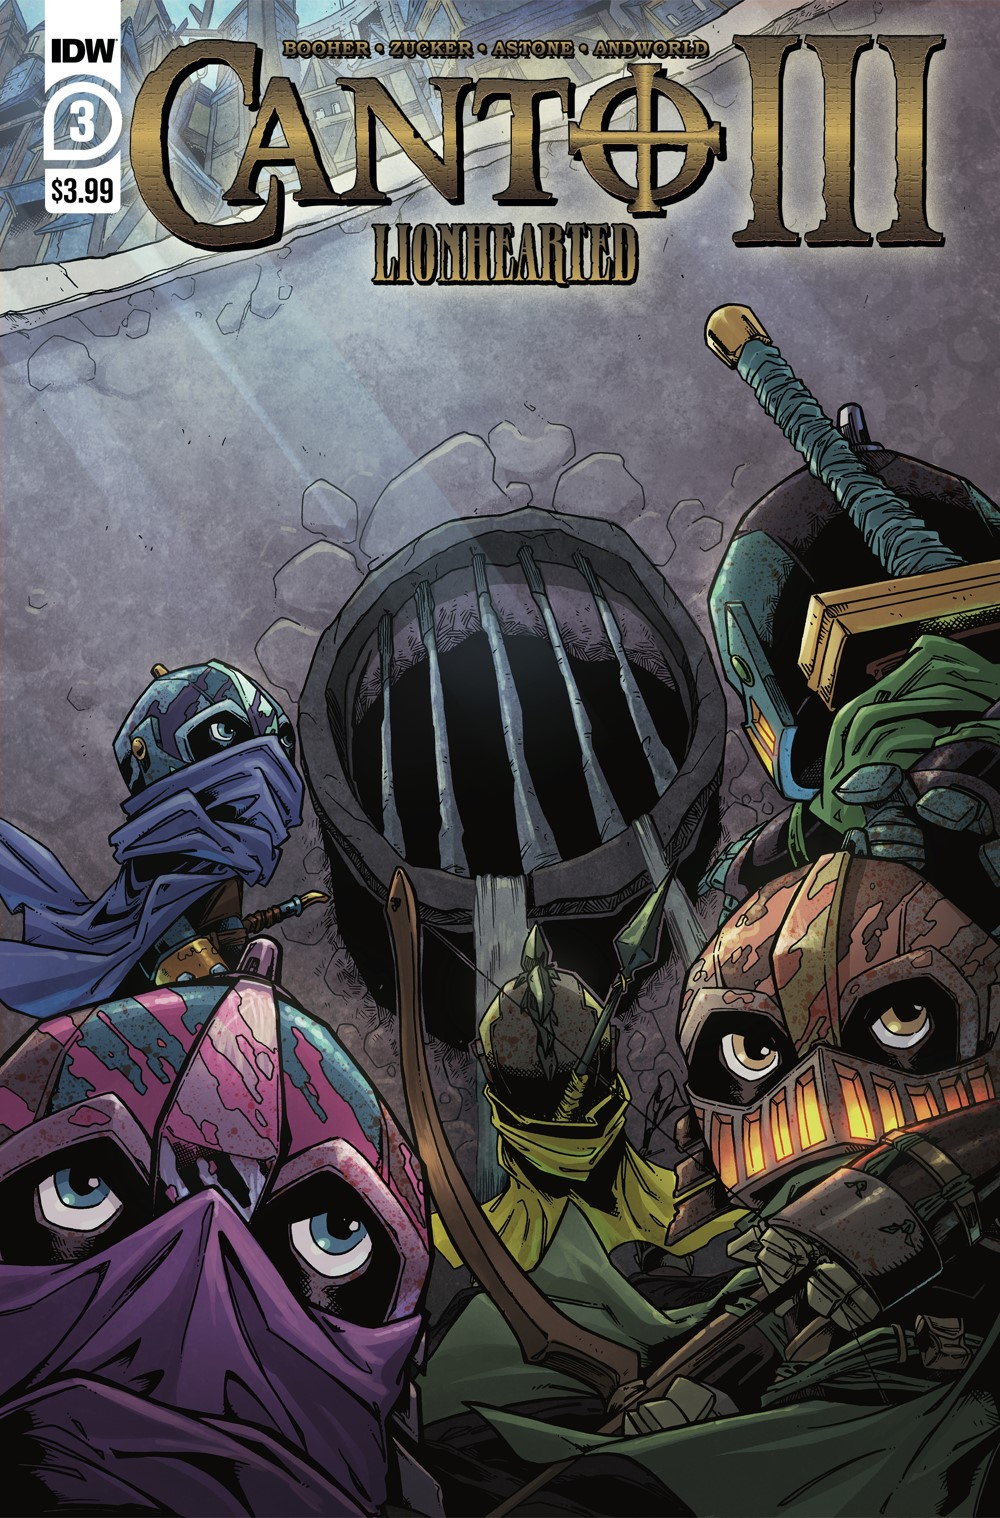 Canto-Lionhearted03_cvrA ComicList Previews: CANTO III LIONHEARTED #3 (OF 6)